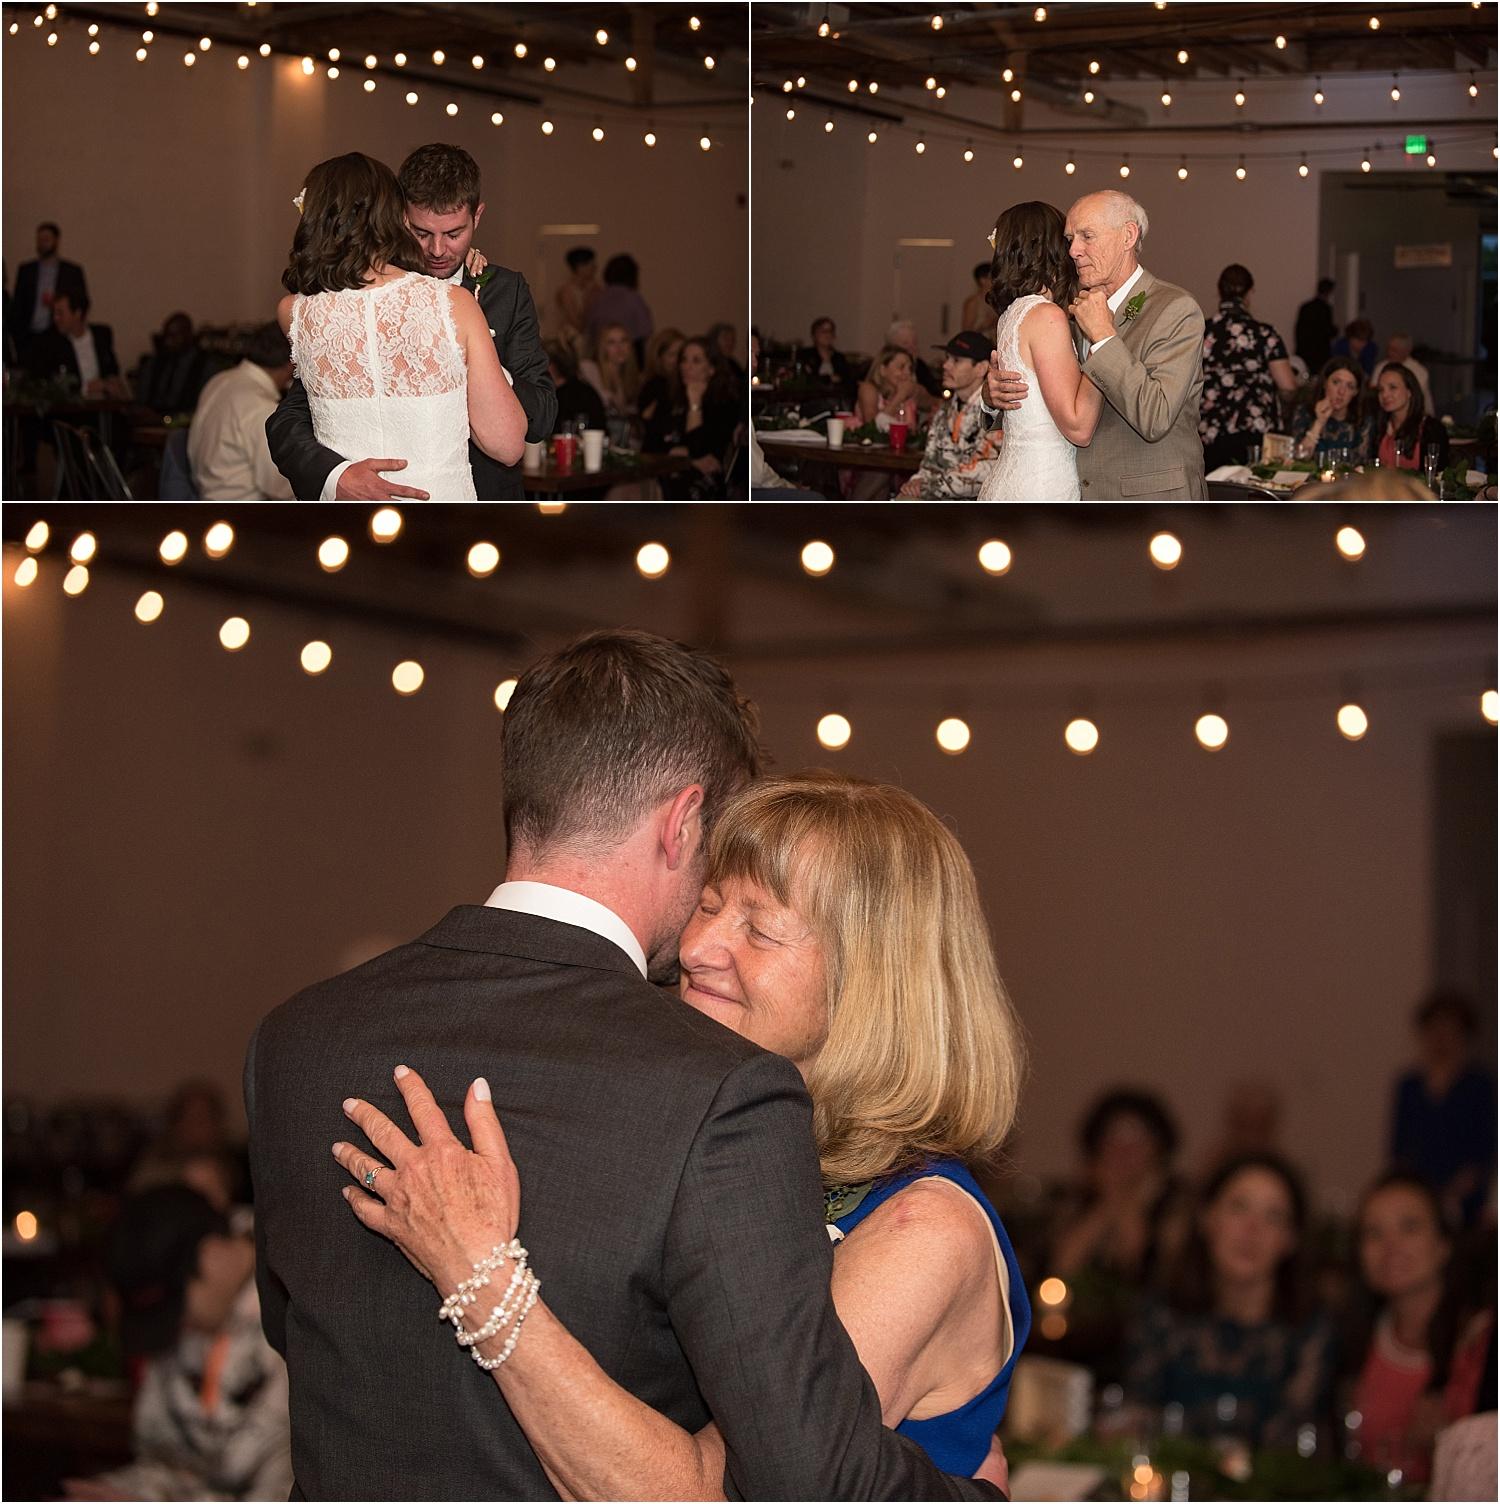 Denver_Wedding_Photography_Skylight_Urban_Venue_Modern_Bride_052.jpg